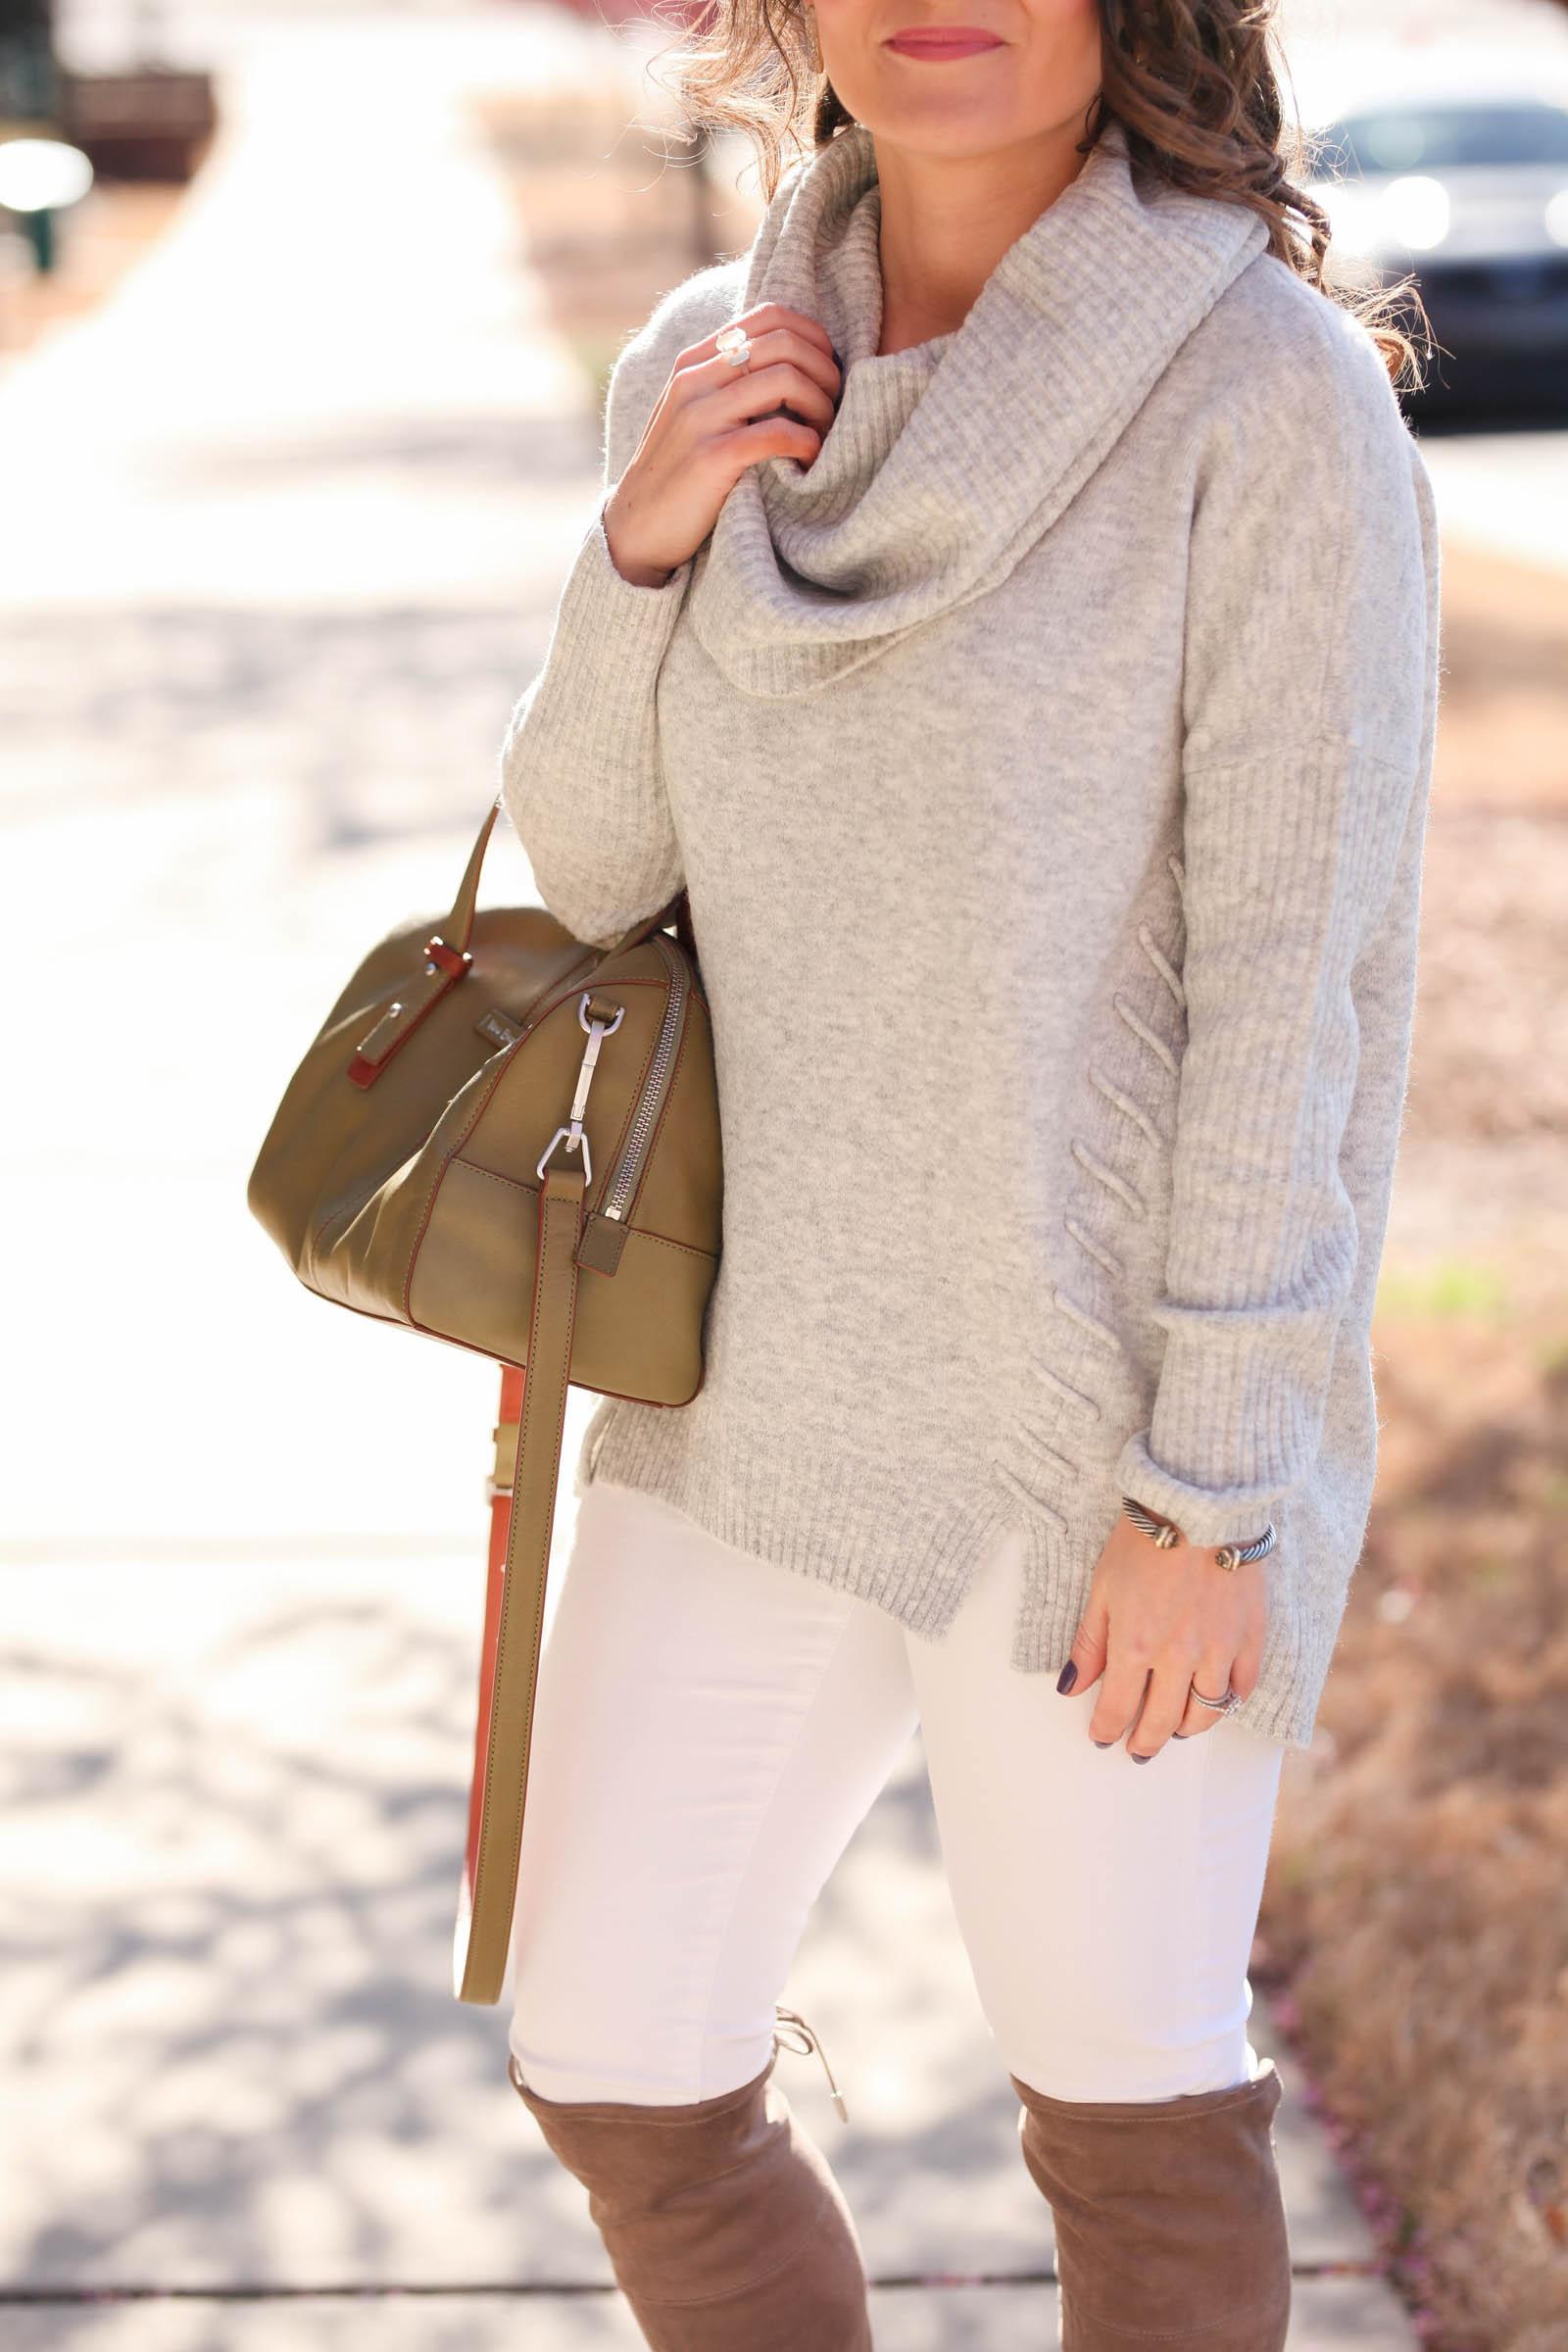 d0c03f2c081 Grey Cowl Neck Sweater + Winter White Denim - Medicine   Manicures